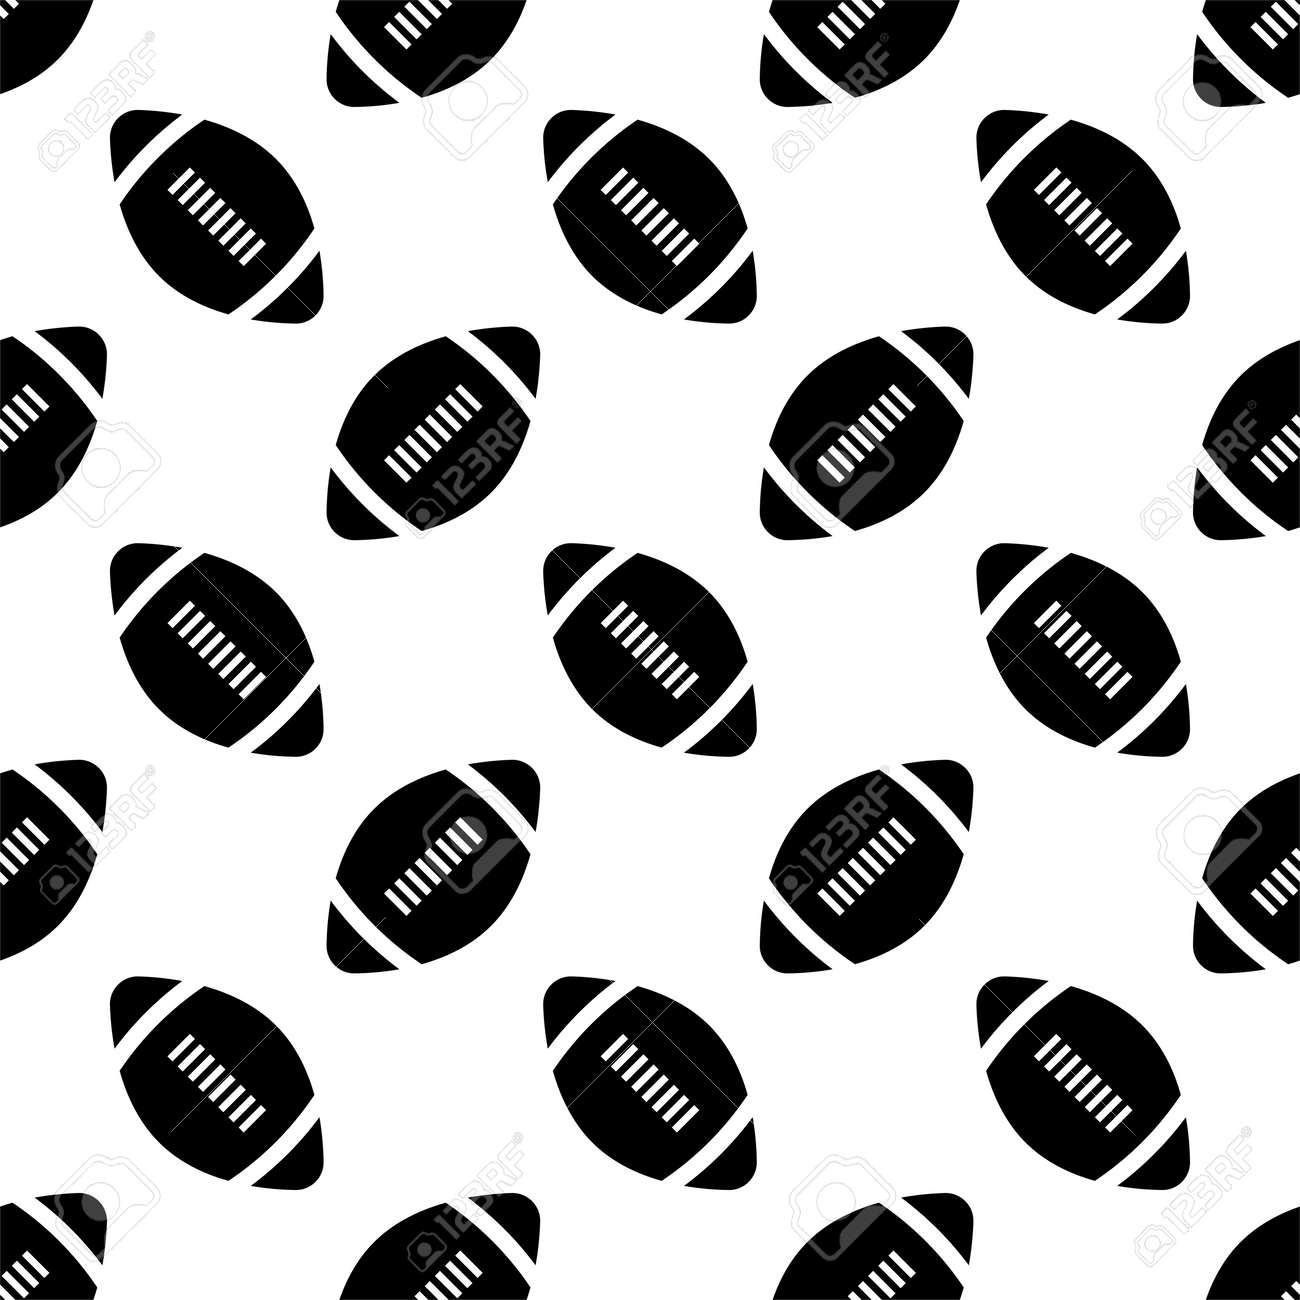 American Football Icon Seamless Pattern, Soccer Ball Seamless Pattern Vector Art Illustration - 149570949